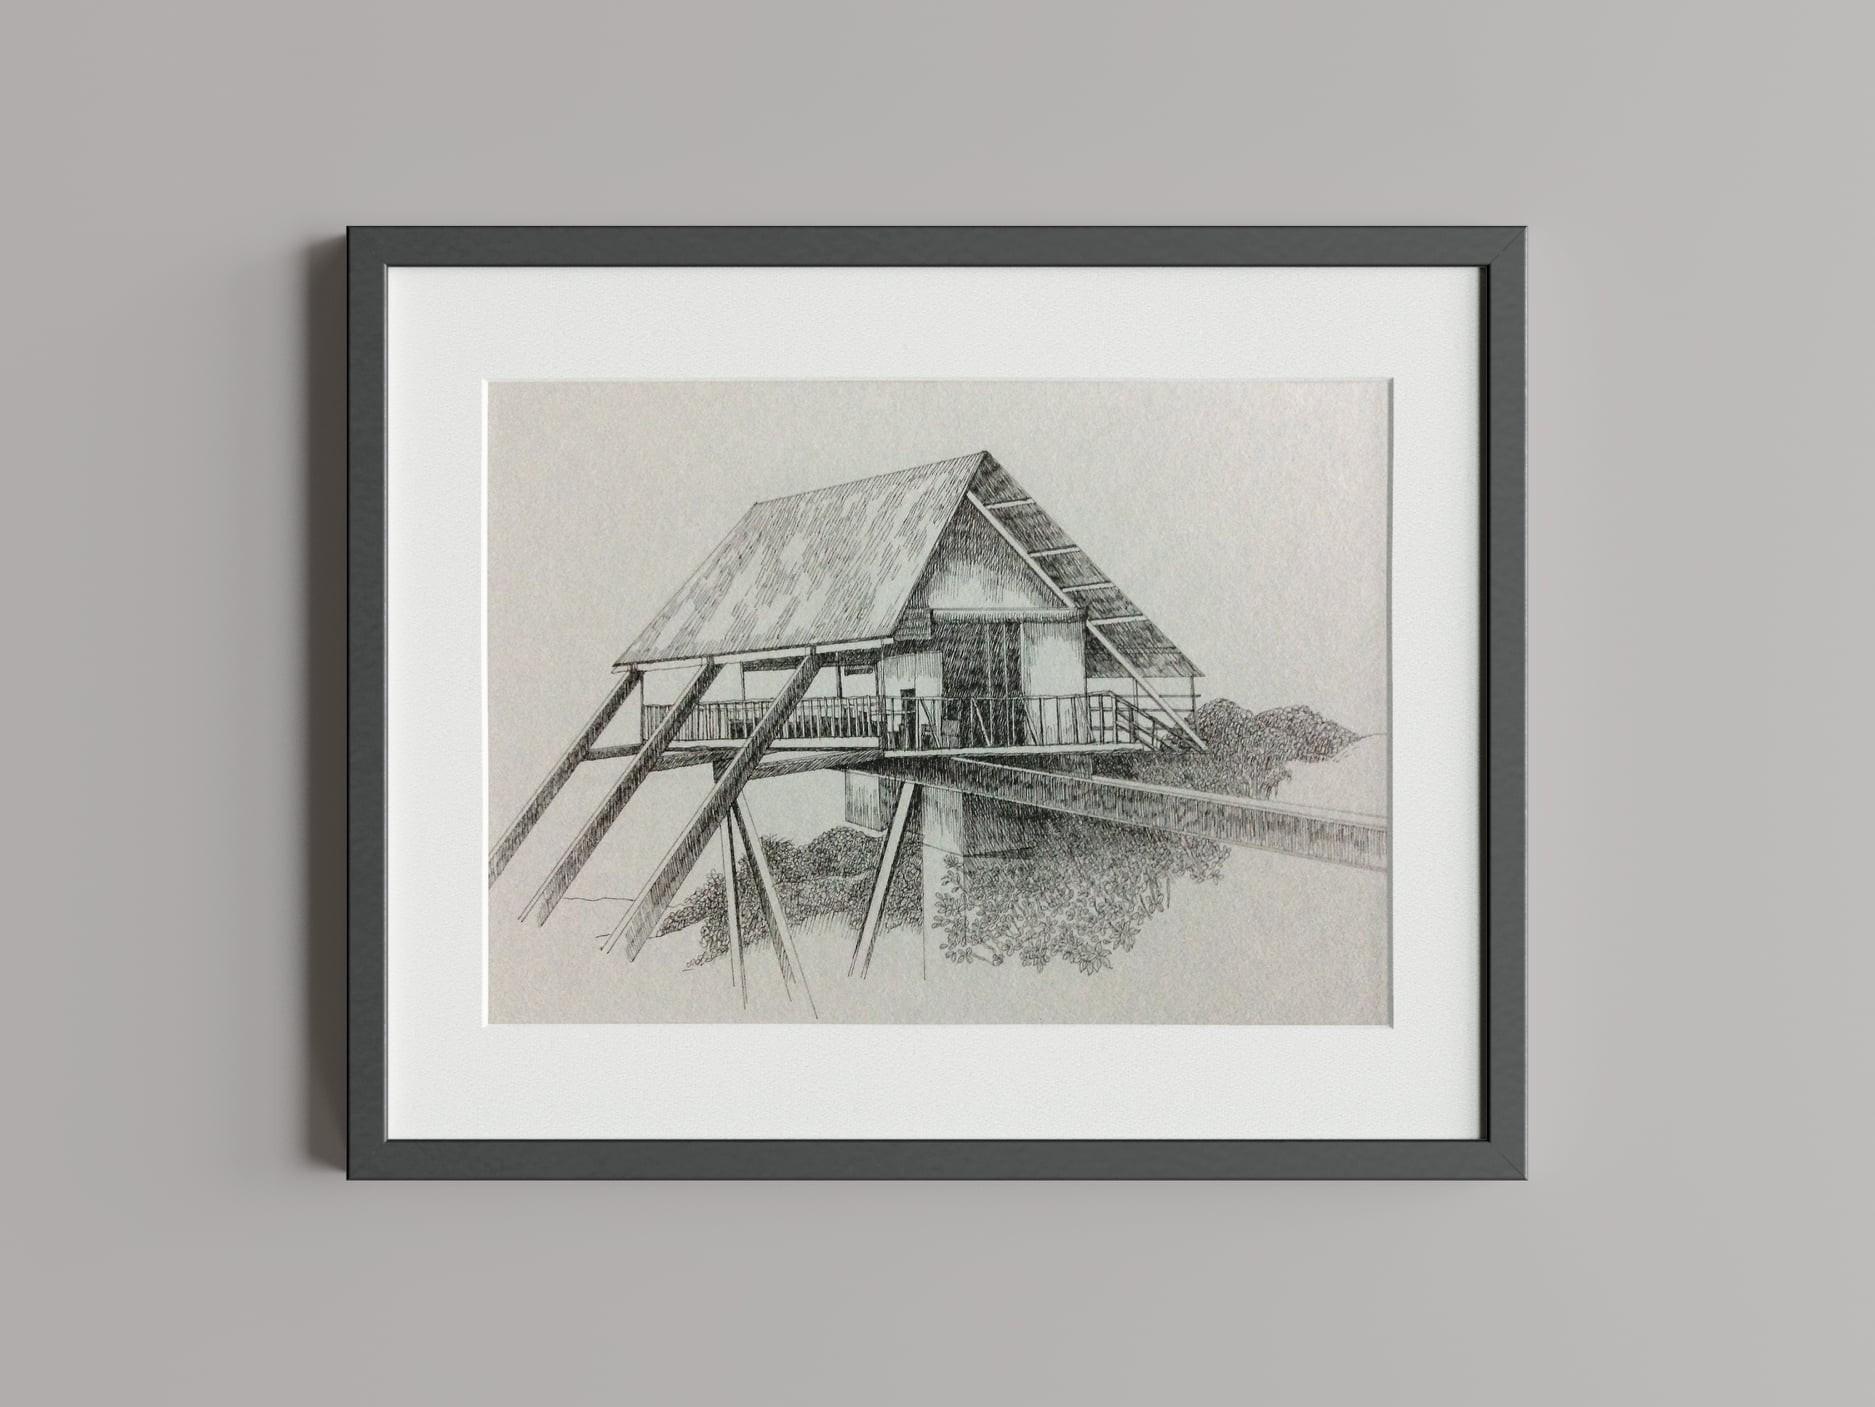 The Ark Villa by THARINDU SAMPATH SIRIWARDANA